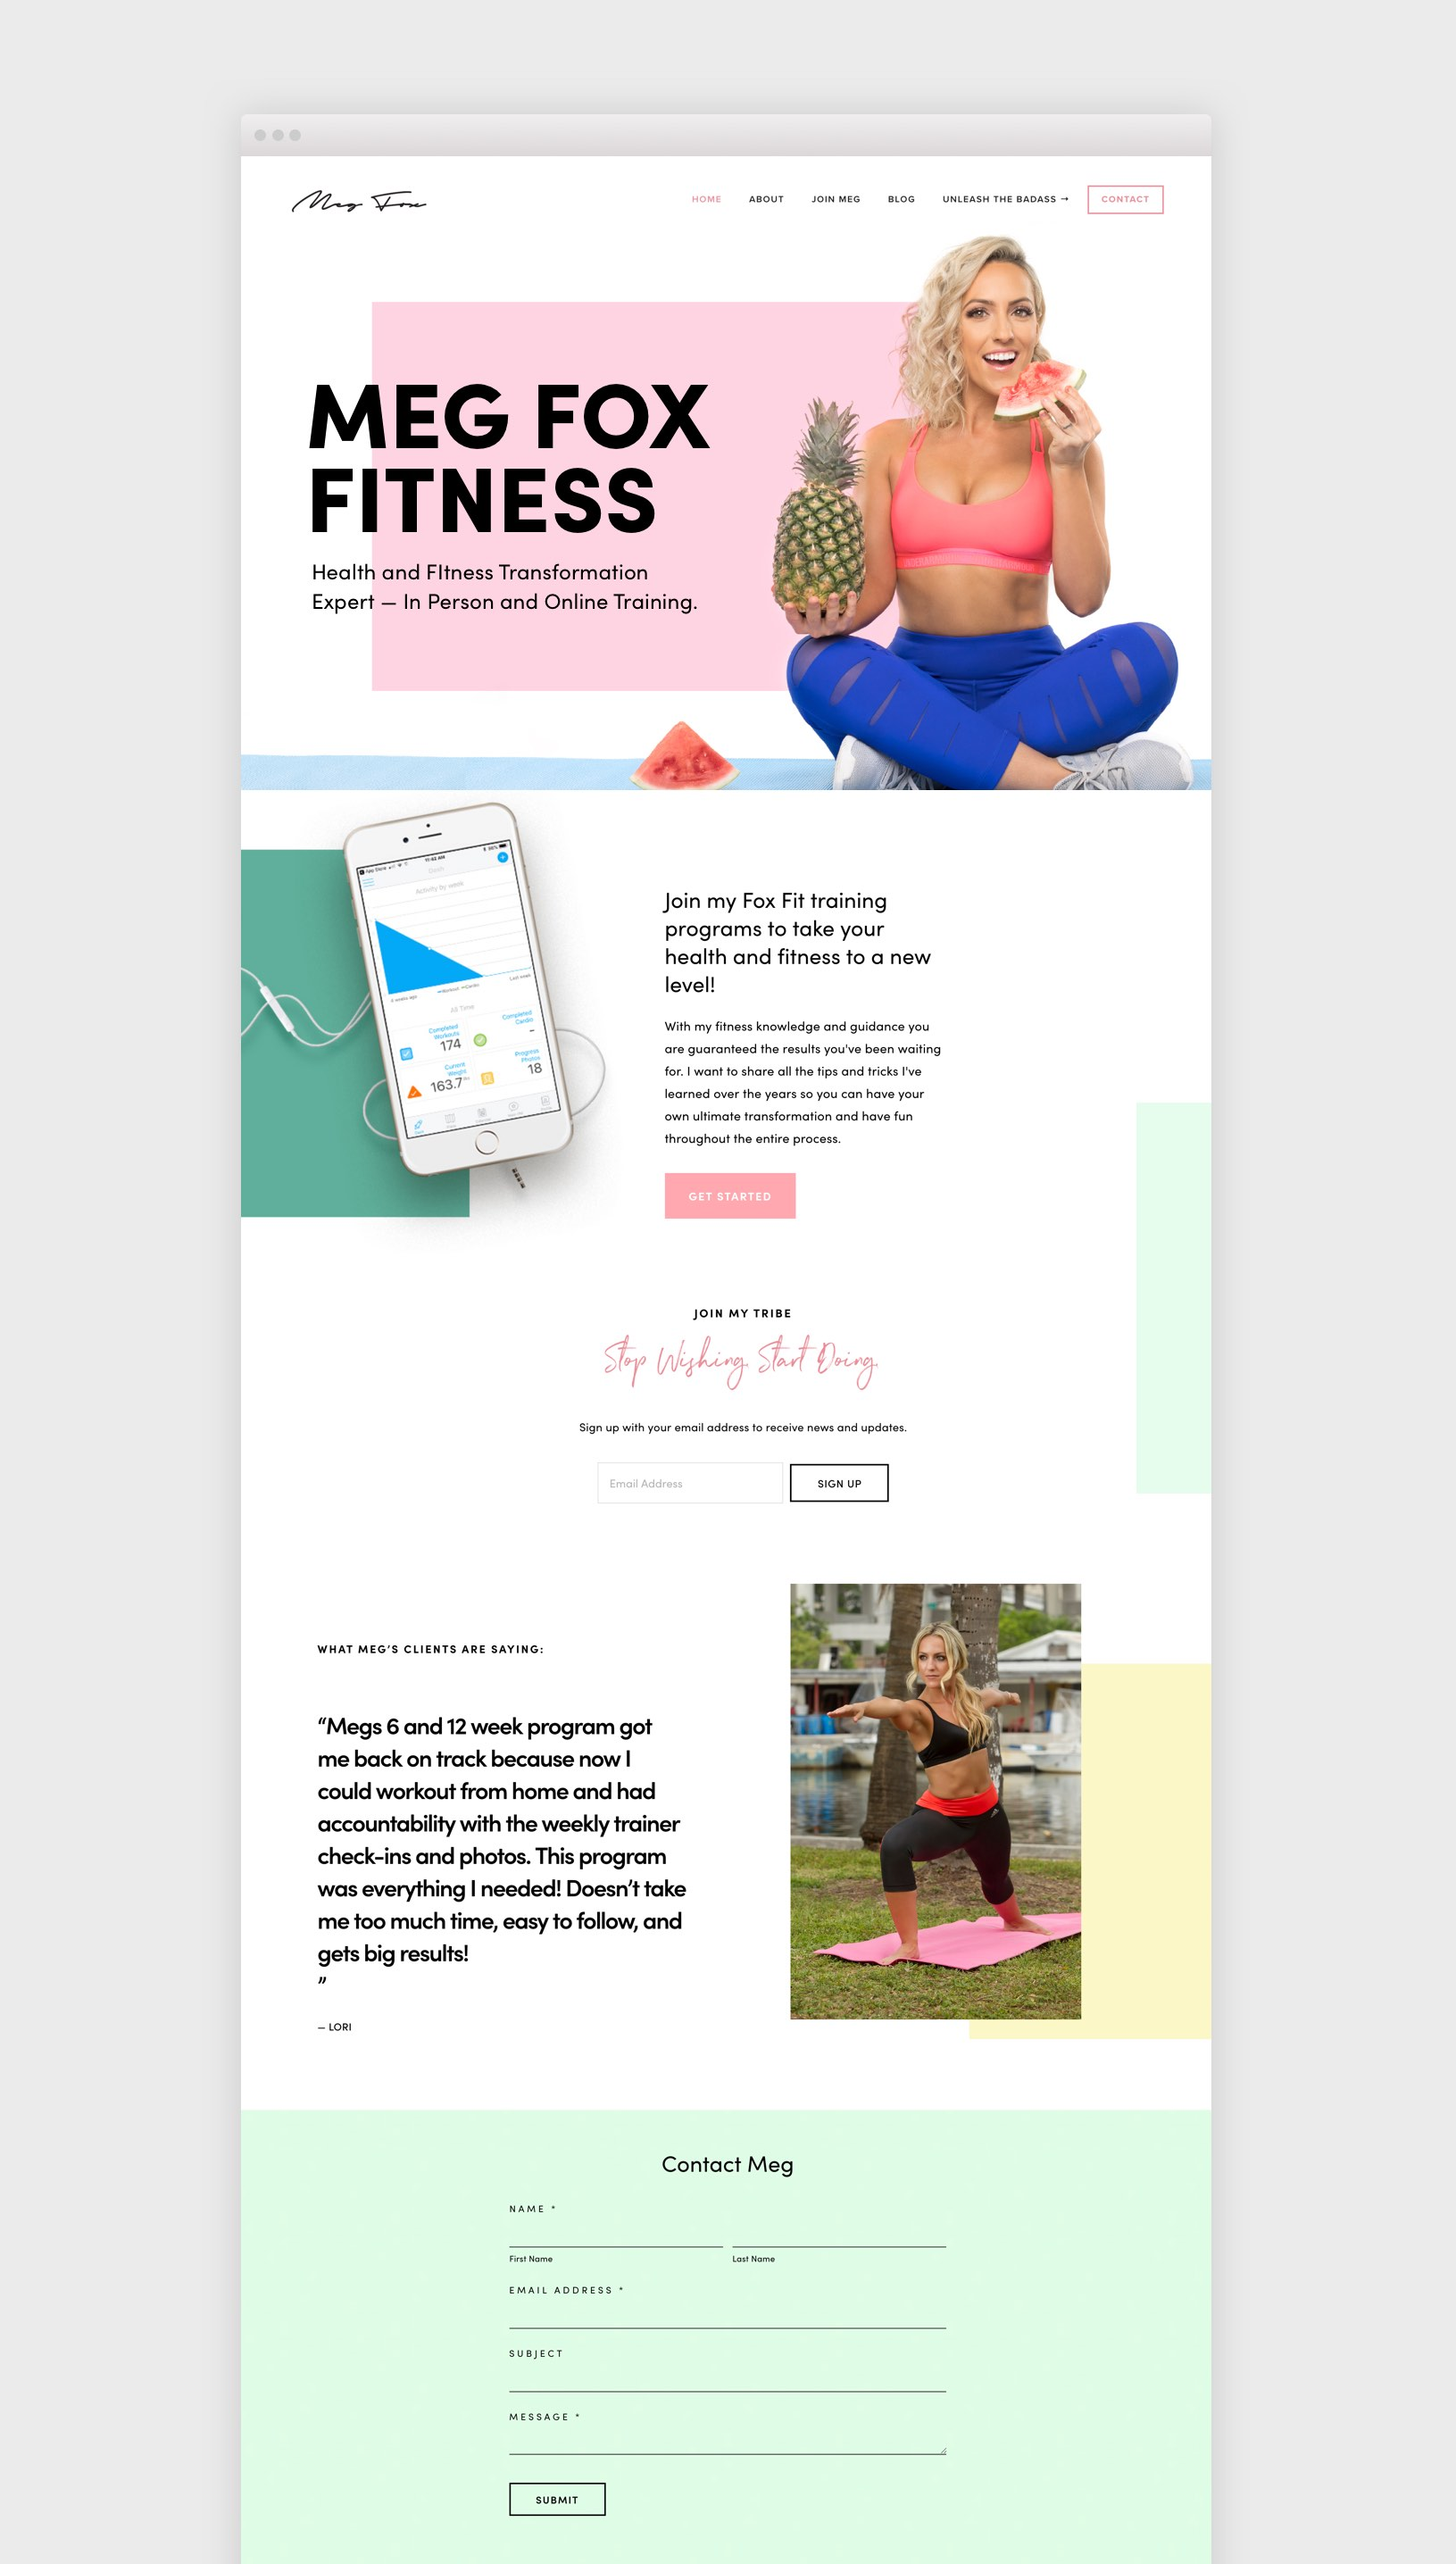 megfox-homepage.jpg